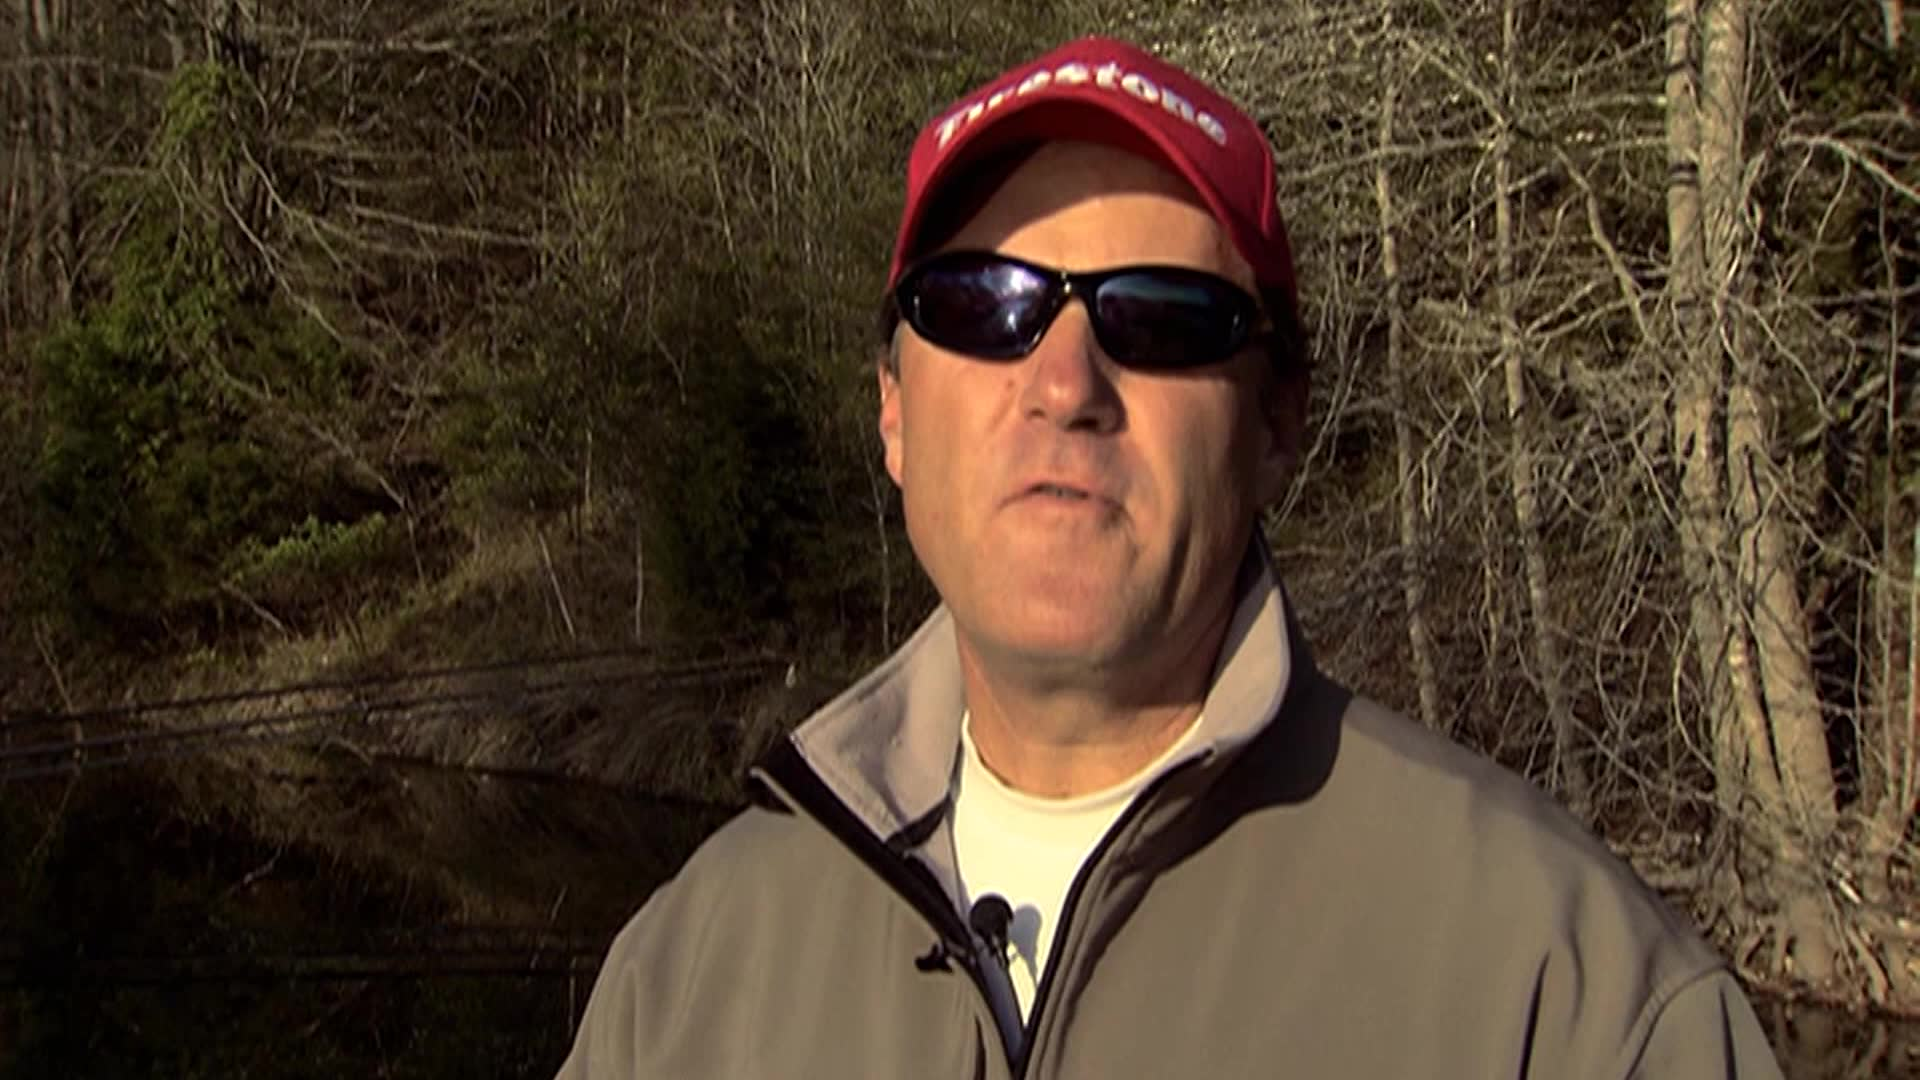 Ultimate Match Fishing - Martens VS Kenney